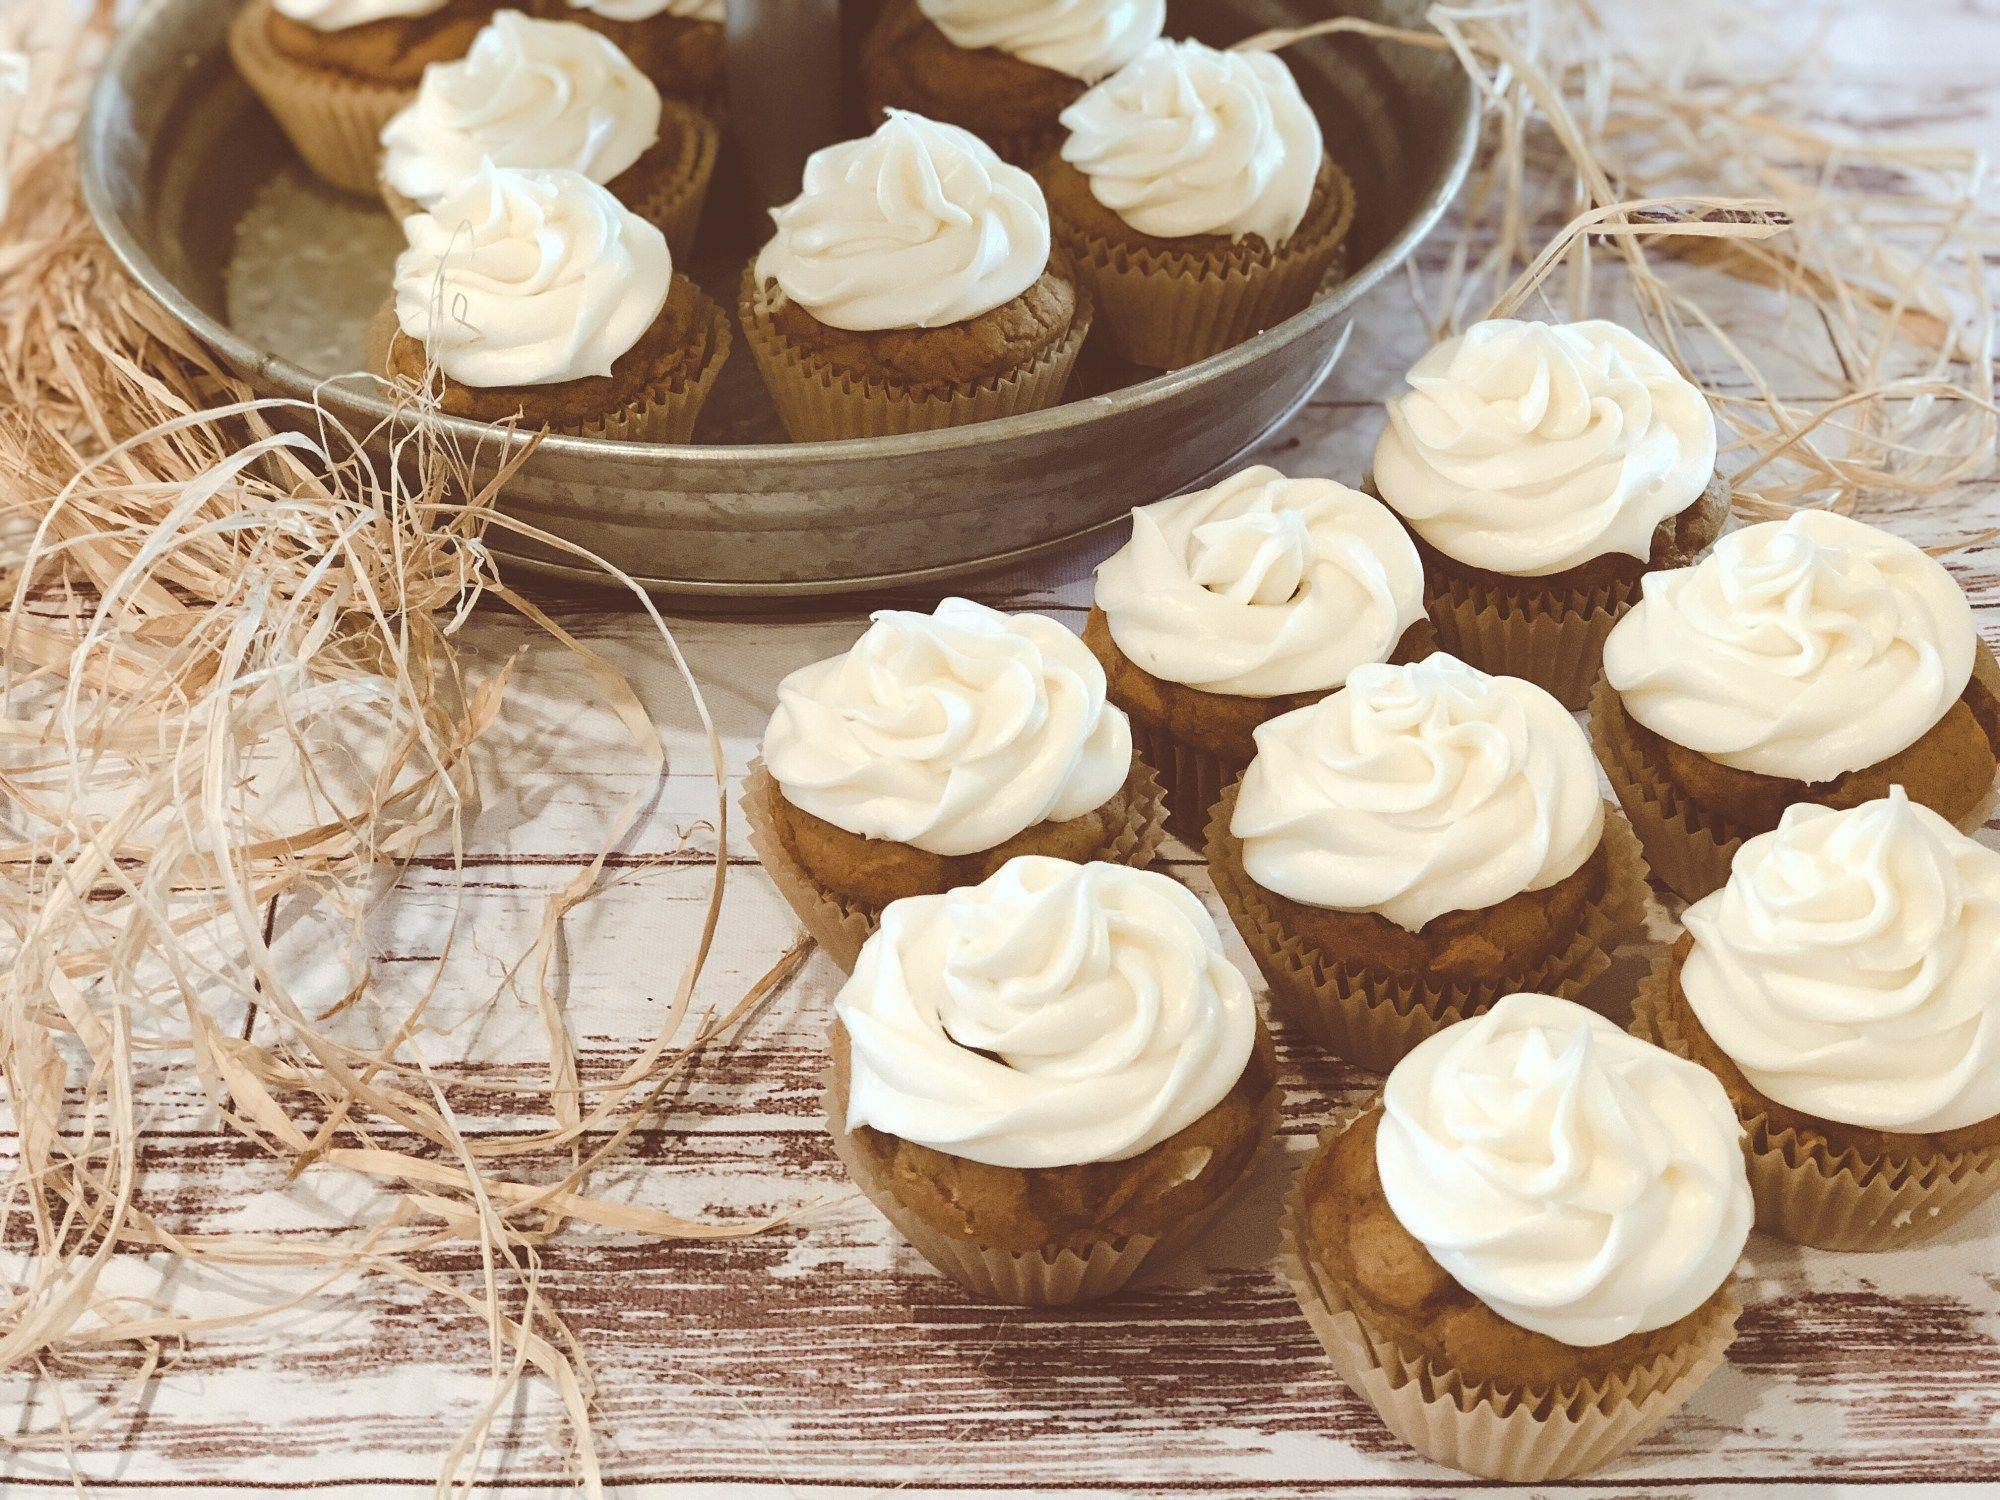 Easy Pumpkin Spice Cupcakes - The Farmwife Feeds #pumpkinspicecupcakes Easy Pumpkin Spice Cupcakes - The Farmwife Feeds #pumpkinspicecupcakes Easy Pumpkin Spice Cupcakes - The Farmwife Feeds #pumpkinspicecupcakes Easy Pumpkin Spice Cupcakes - The Farmwife Feeds #pumpkinspicecupcakes